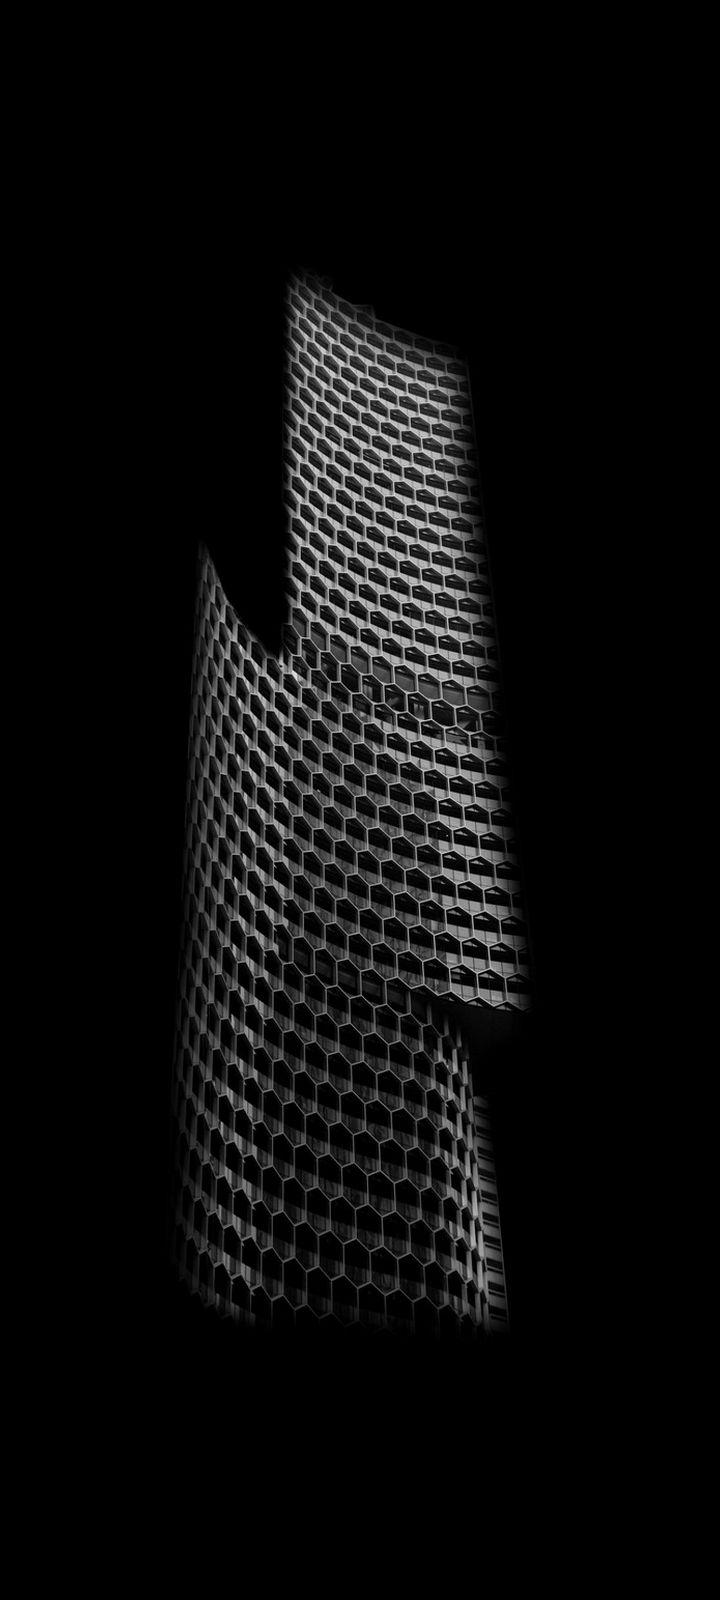 Building Shadow Minimalism Wallpaper 720x1600